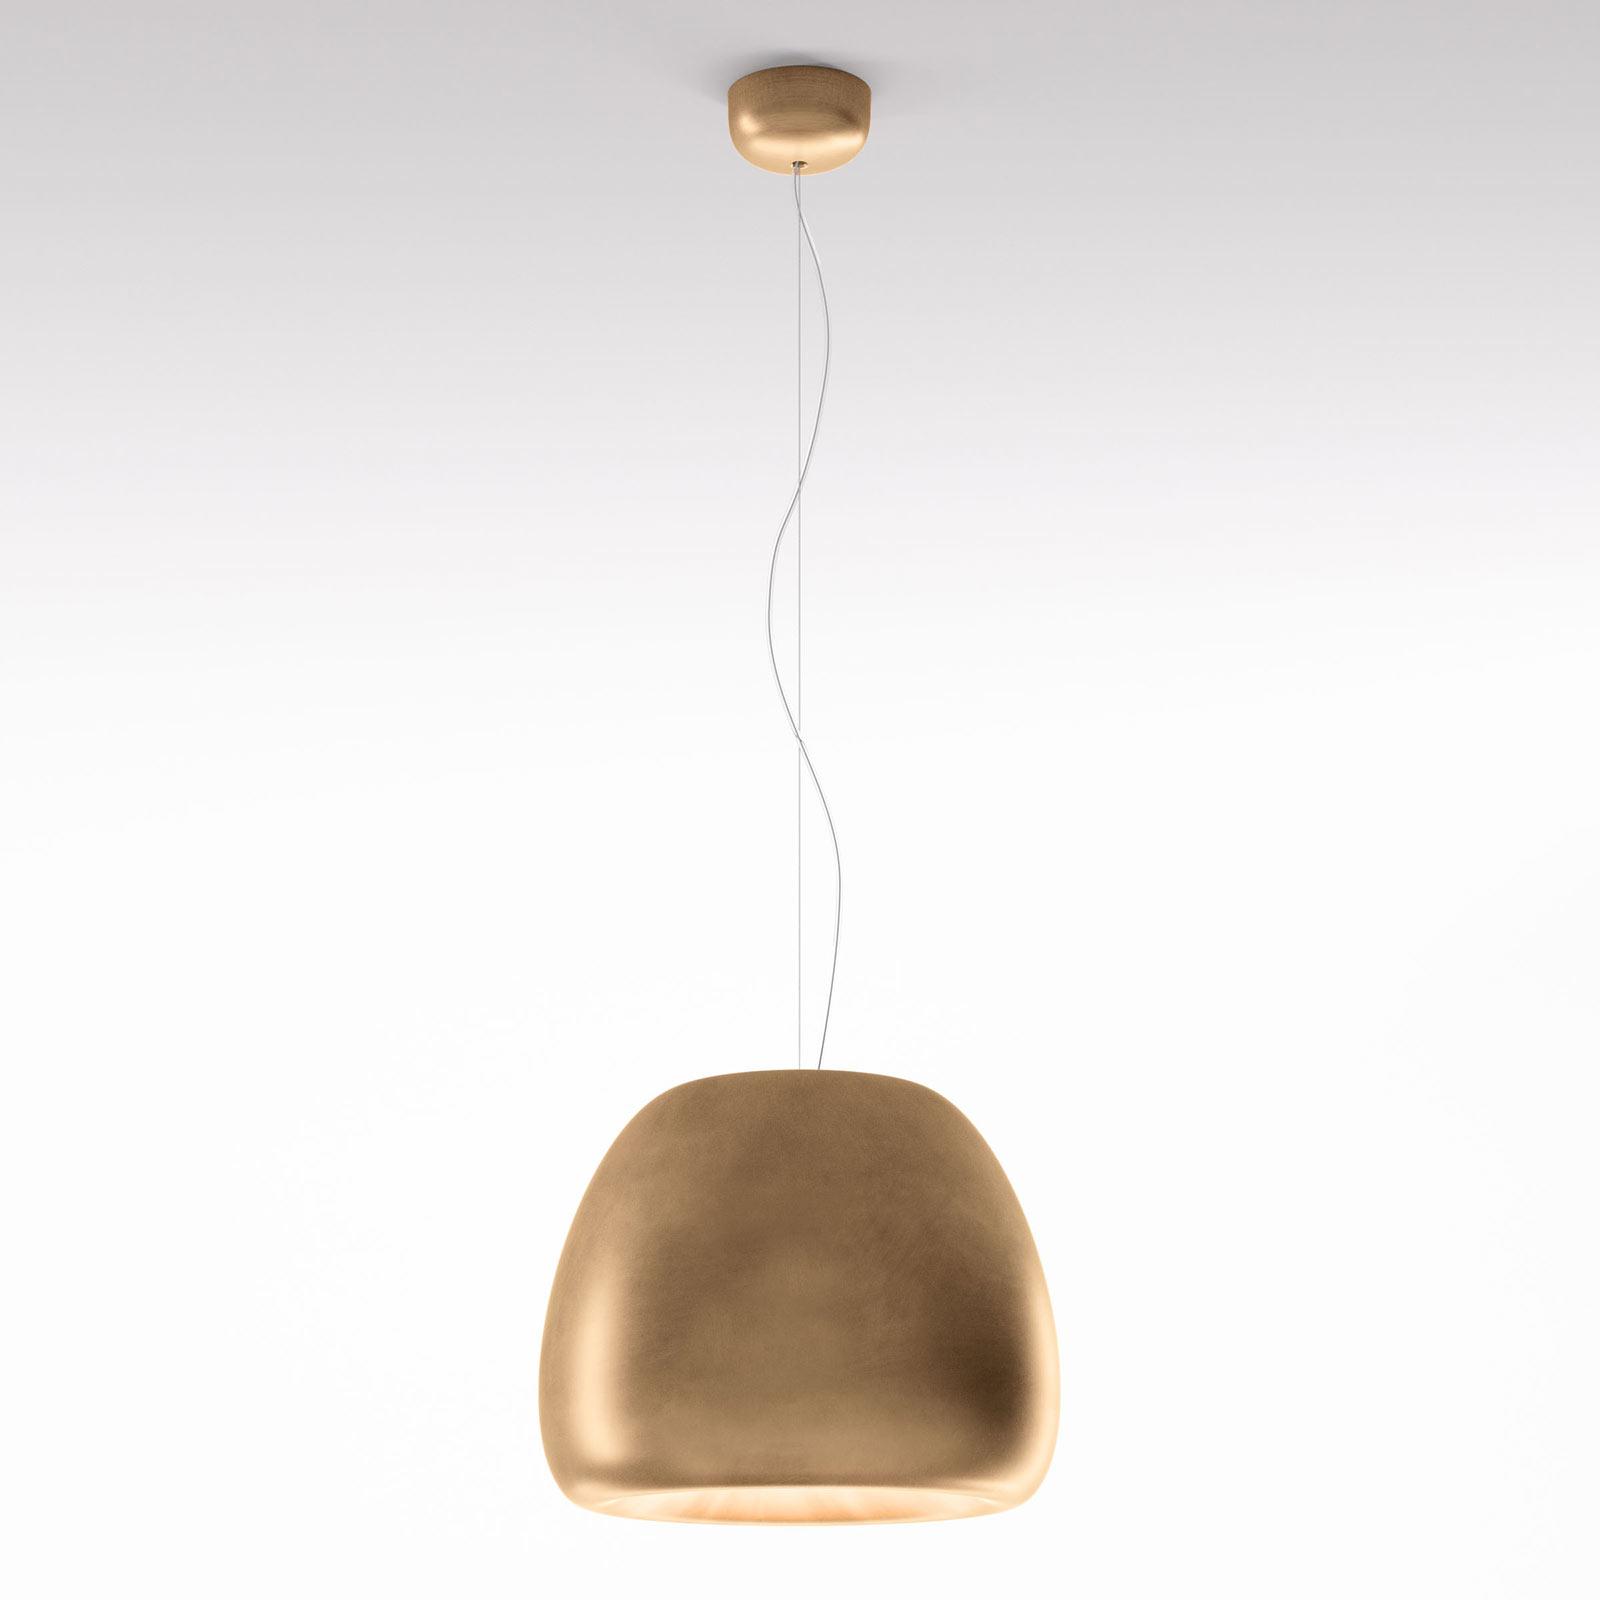 Rotaliana Pomi H2 Hängeleuchte gold Ø 41,5 cm